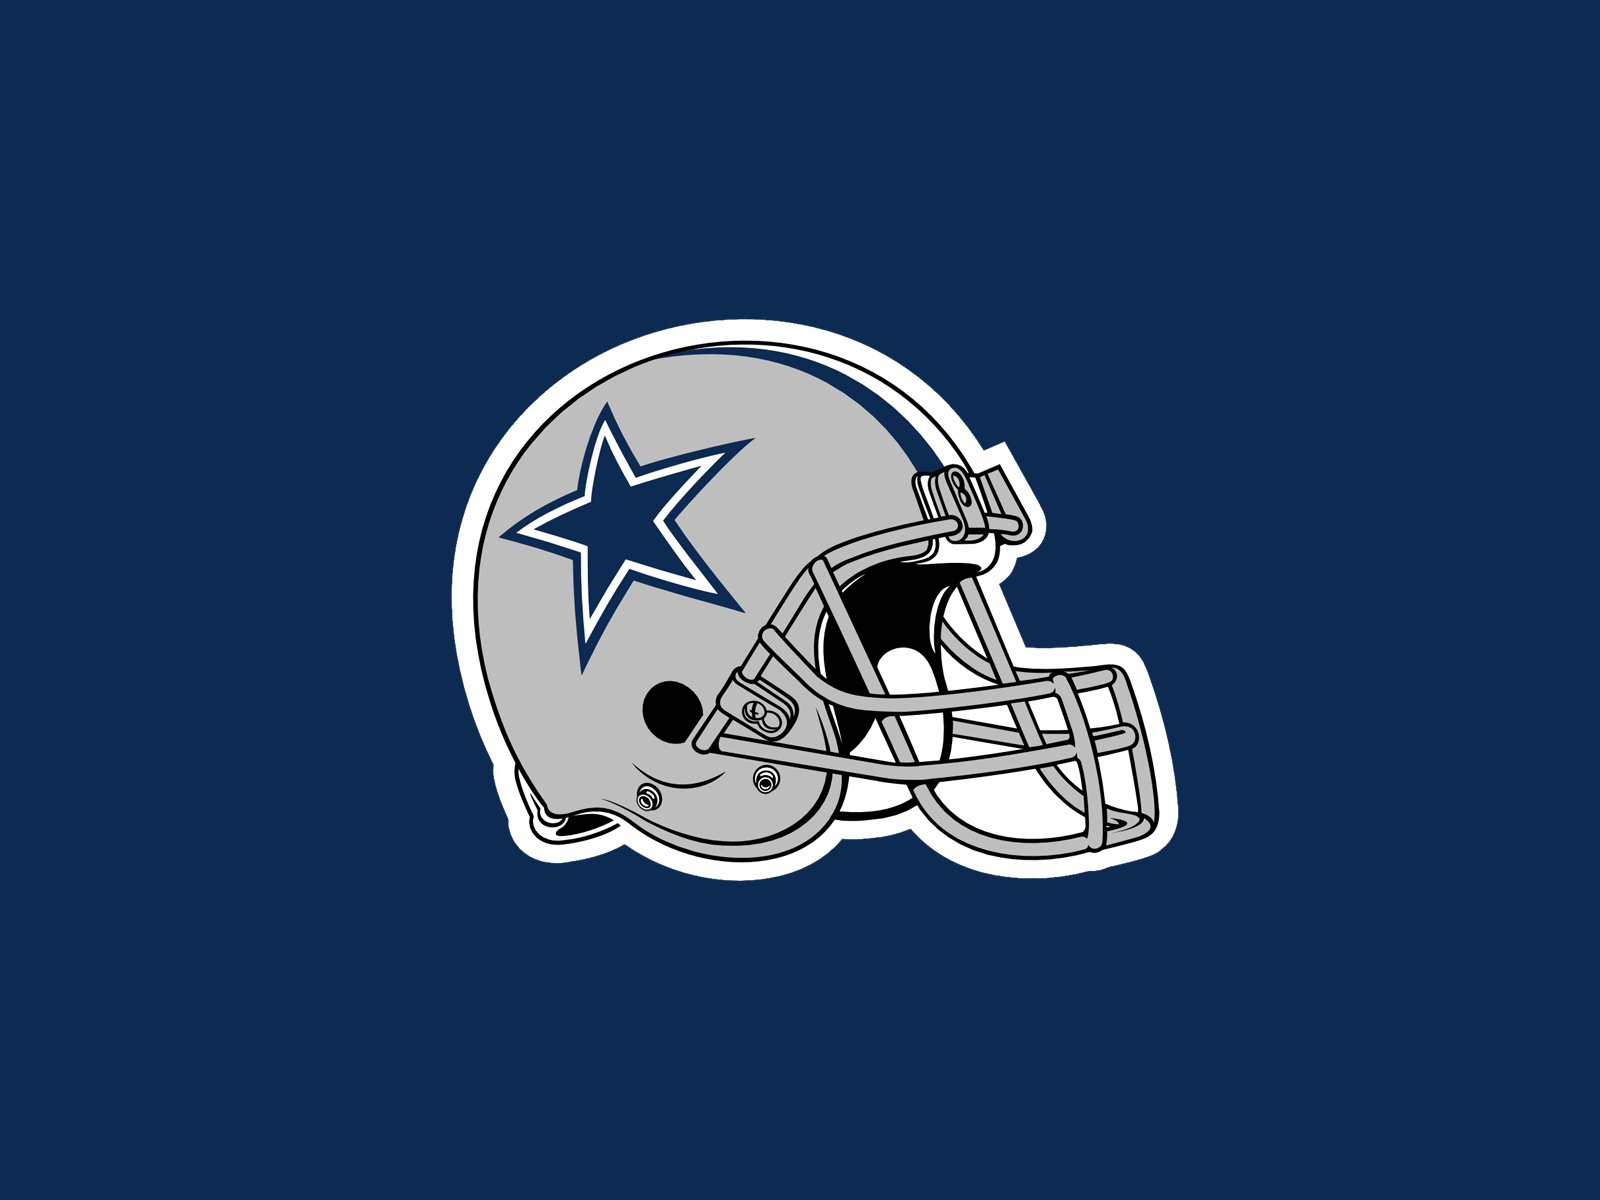 61 Dallas Cowboys HD Wallpapers